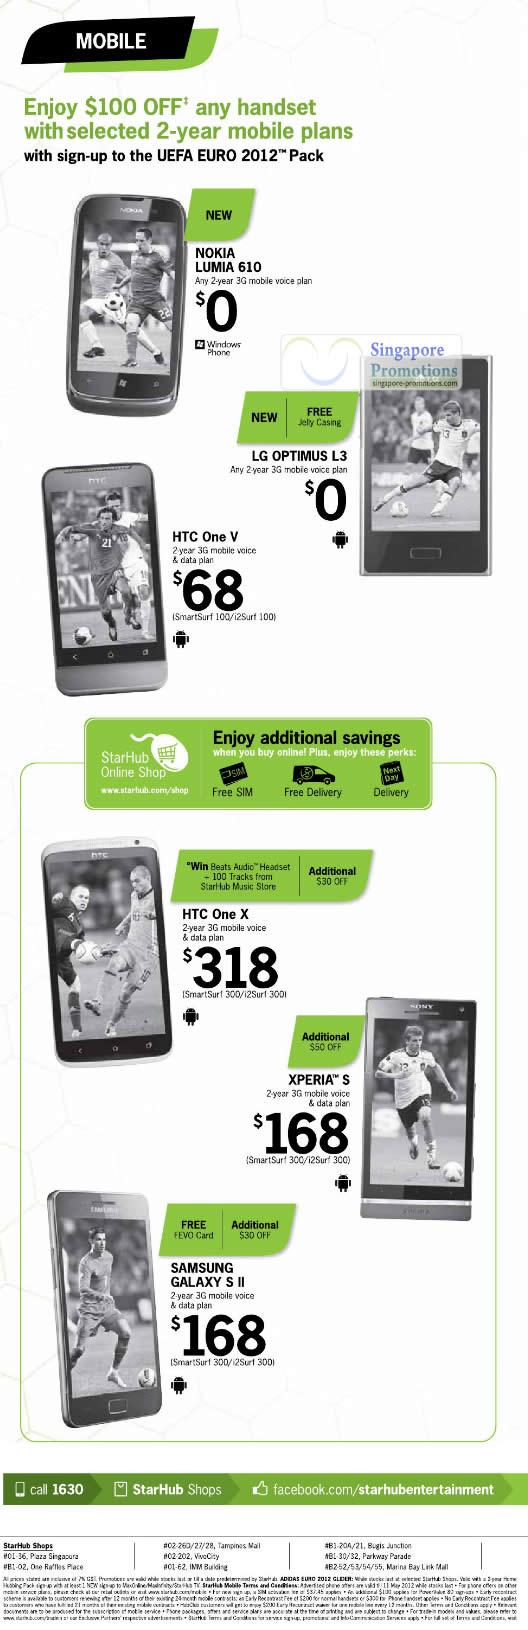 Nokia Lumia 610, LG Optimus L3, HTC One V, One X, Sony Xperia S, Samsung Galaxy S II